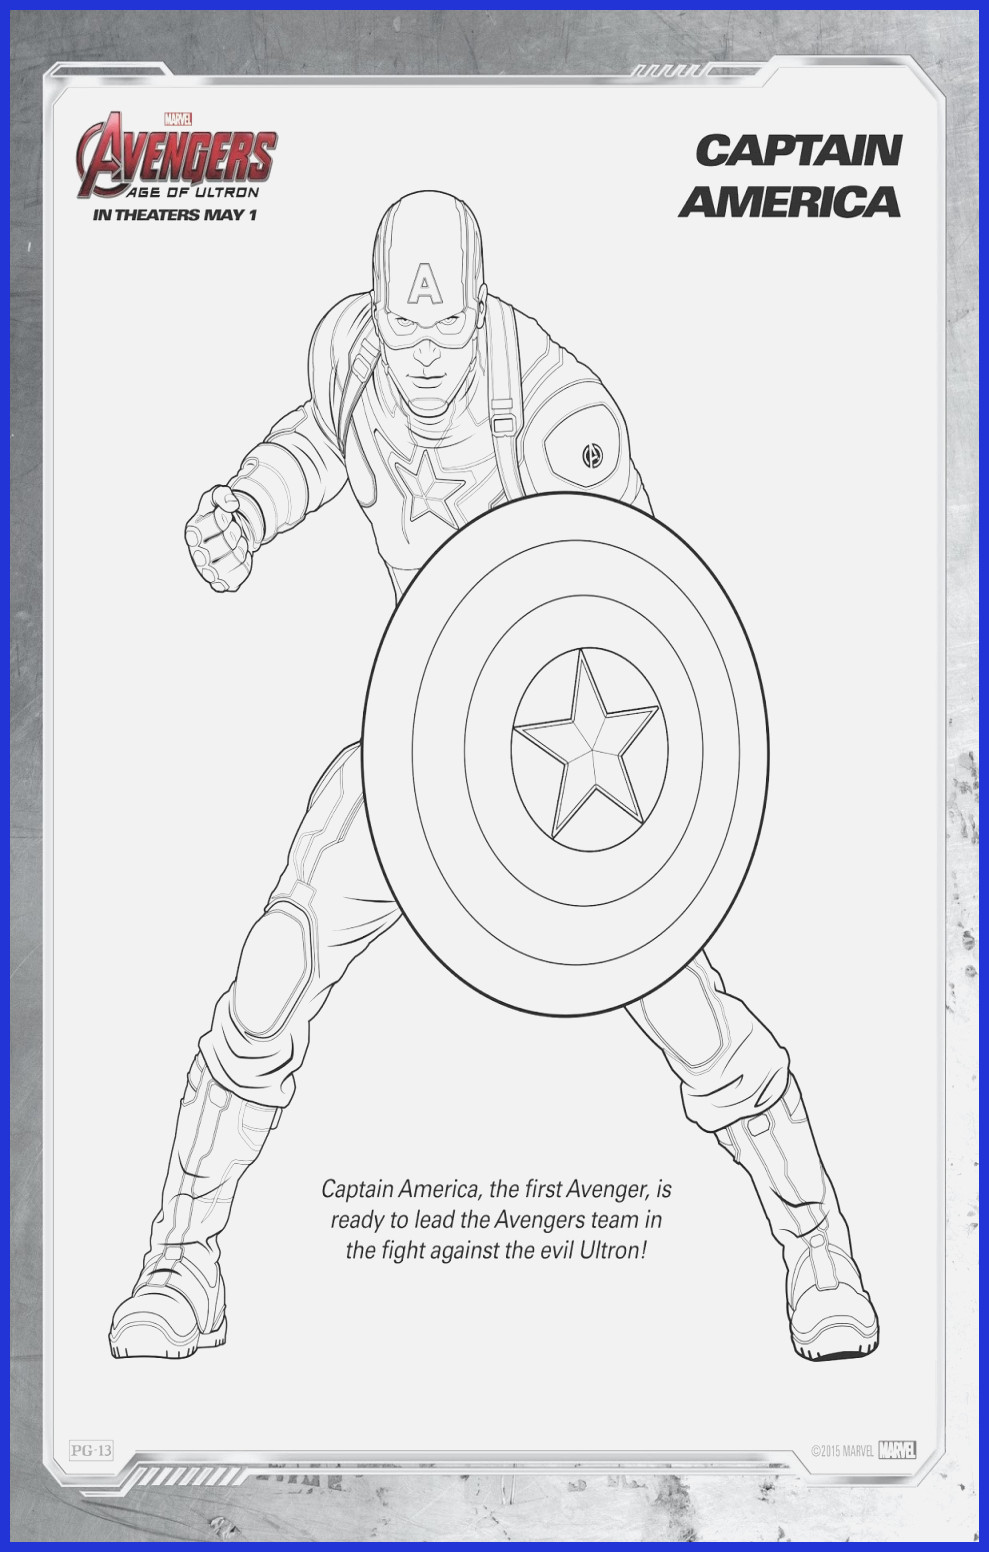 Ausmalbilder Captain America Genial Captain America Coloring Sheet Das Bild